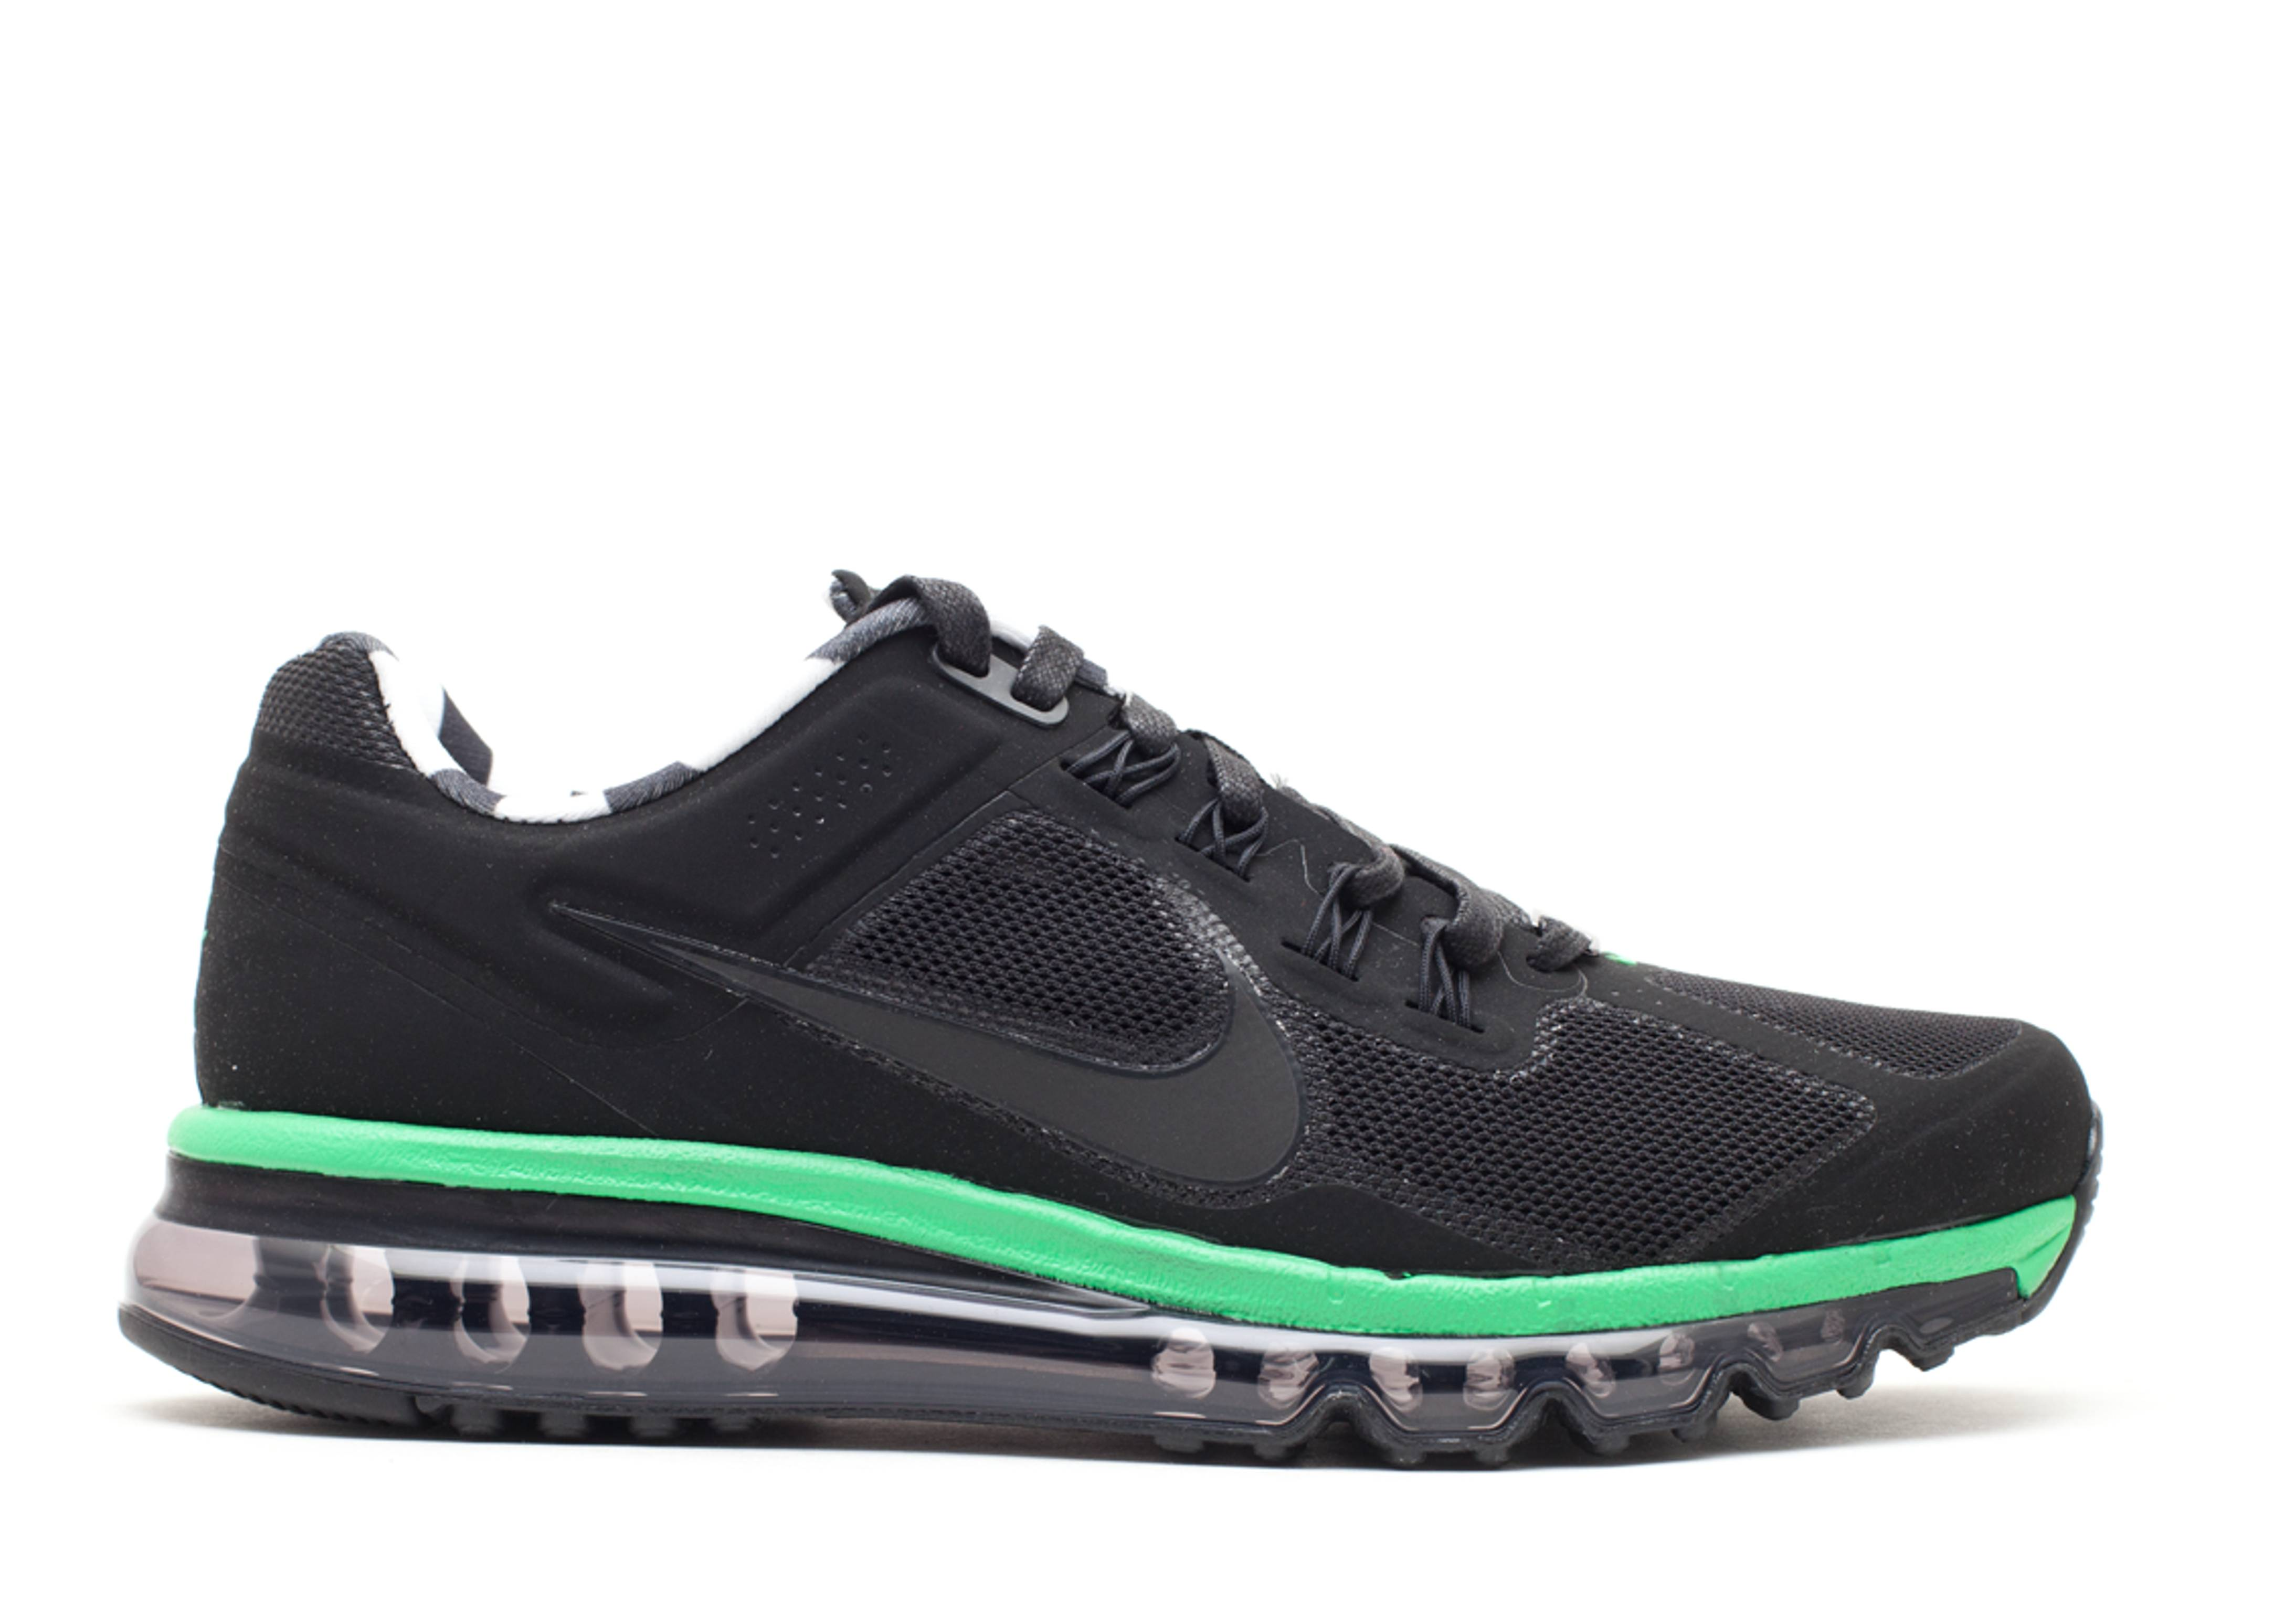 Air Max 2013+ Paris Qs - Nike - 586851 003 - black black-lush green-black  9420f1e7f8be